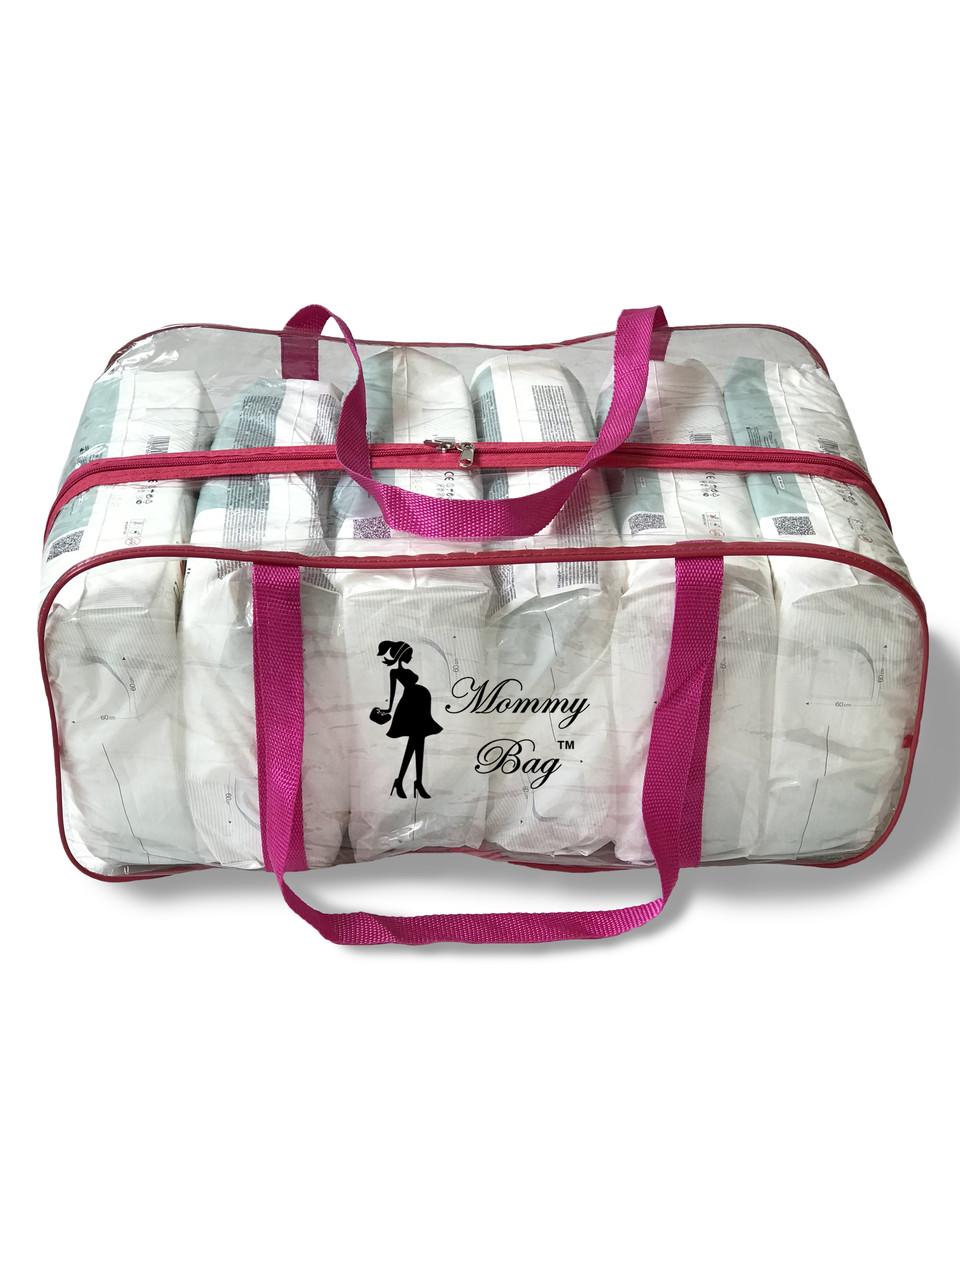 Сумка прозрачная в роддом Mommy Bag - L - 50*23*32 см Розовая